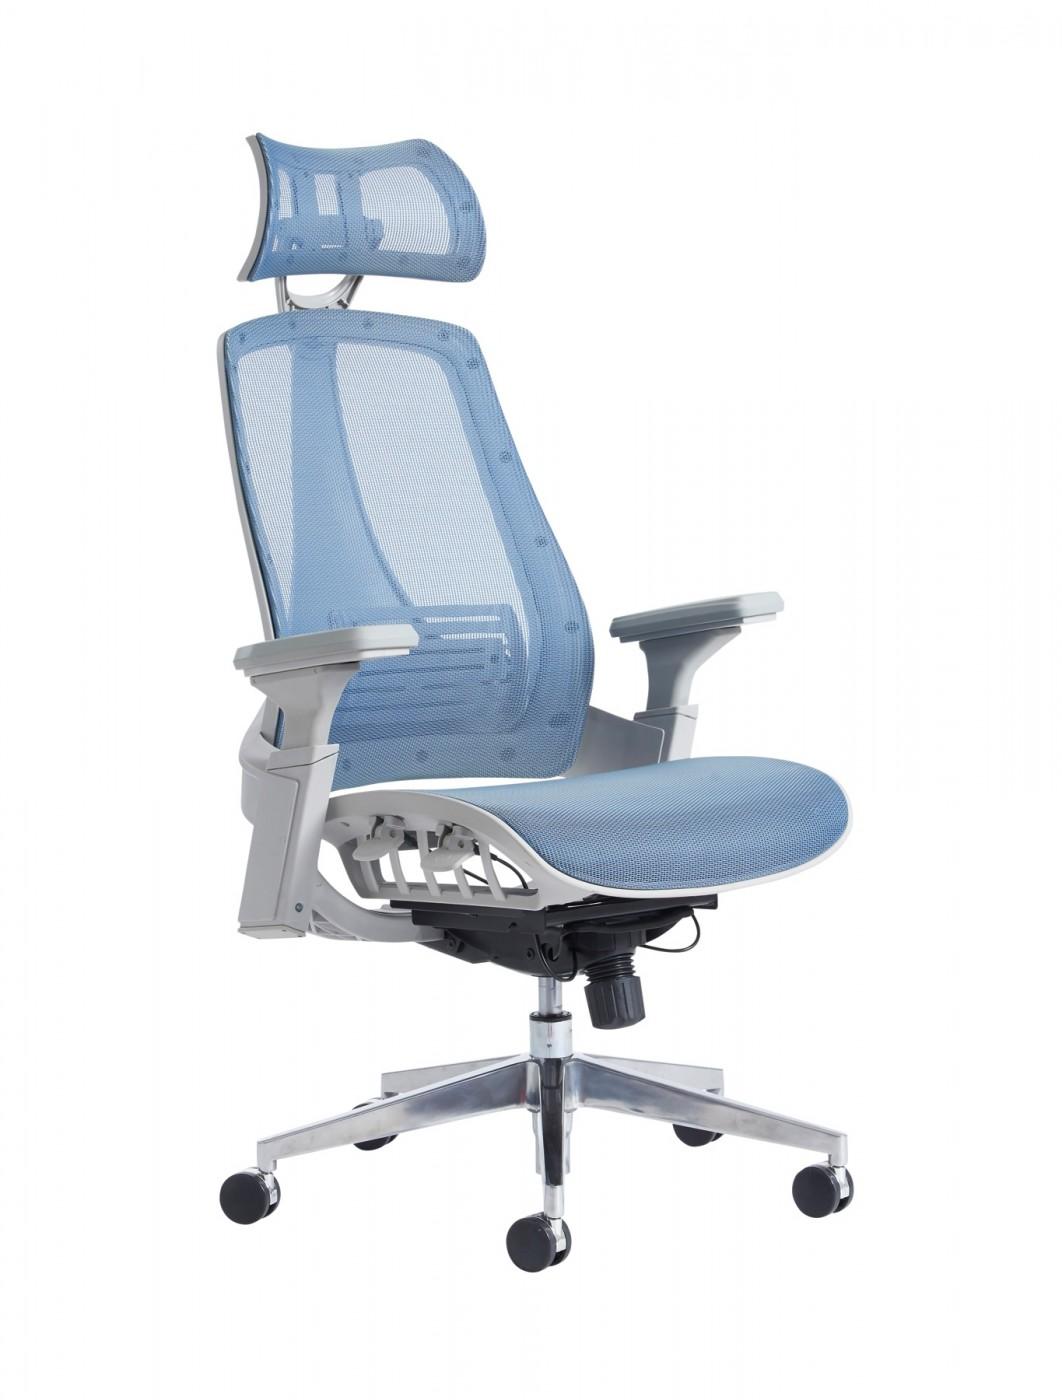 Back posture chair - Dams Sorrento Mesh Back Posture Chair Sor300k2 B Enlarged View